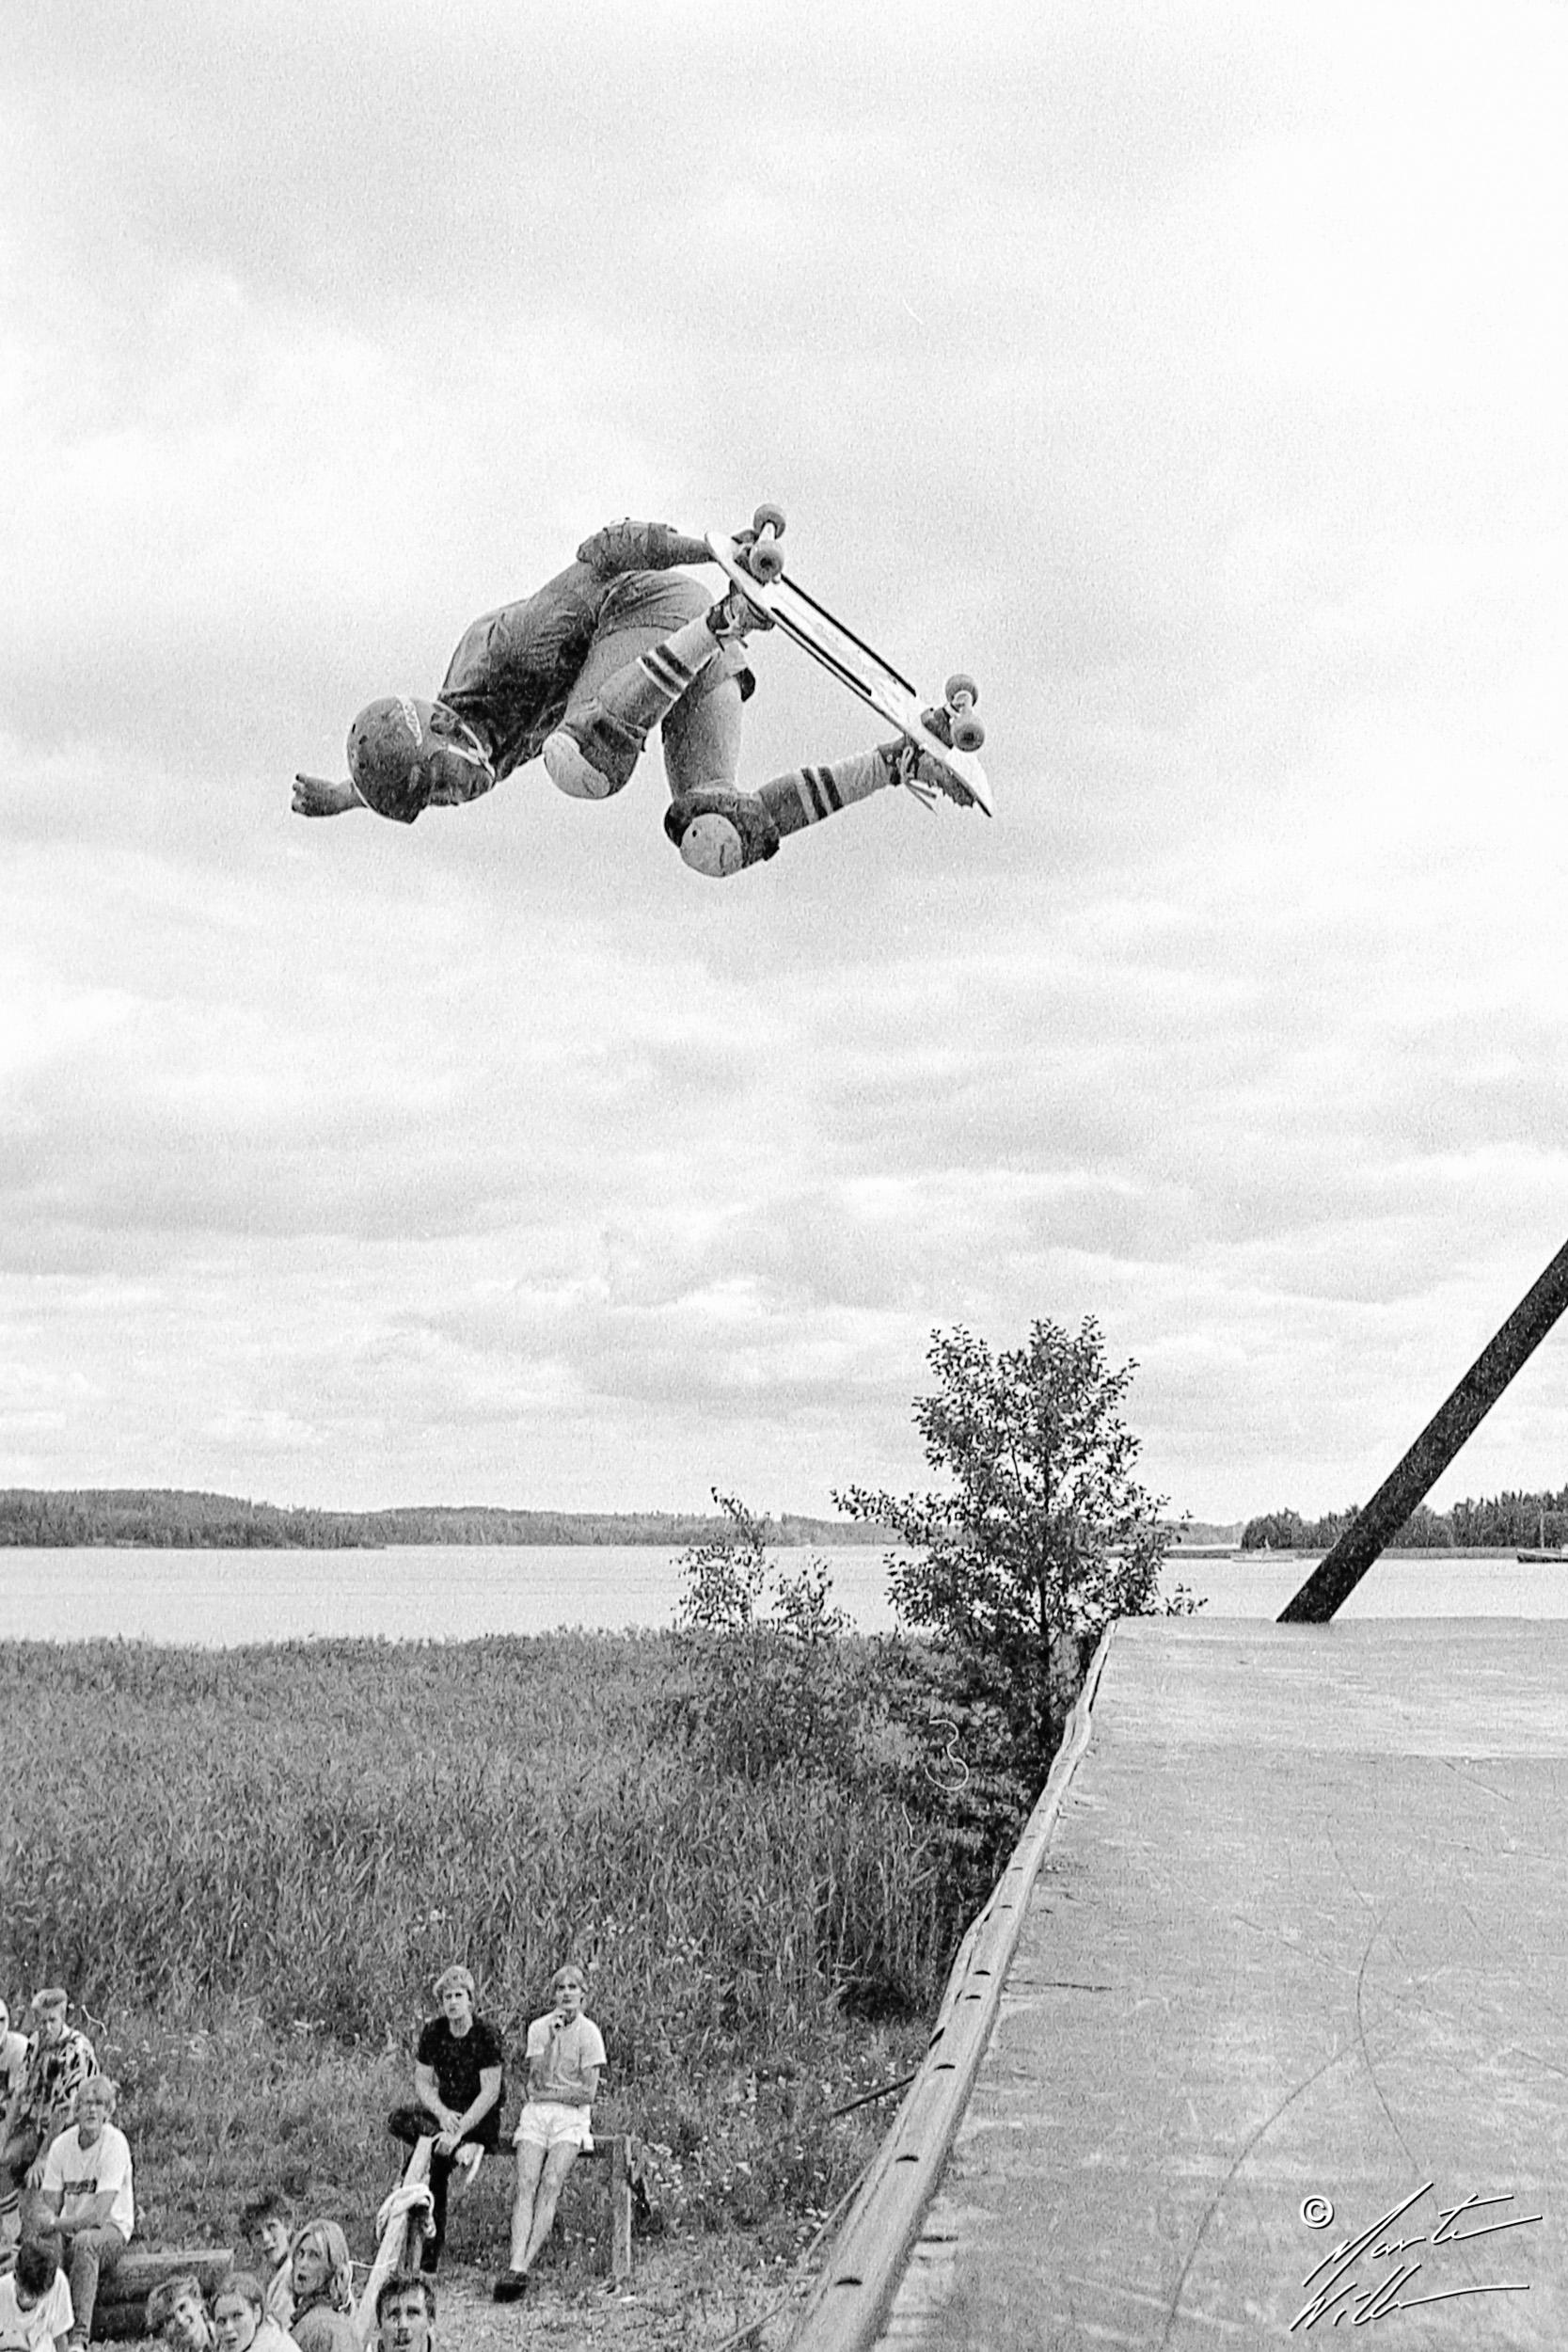 Mikael Adolfsson, Backside air, SM 1984, Täby